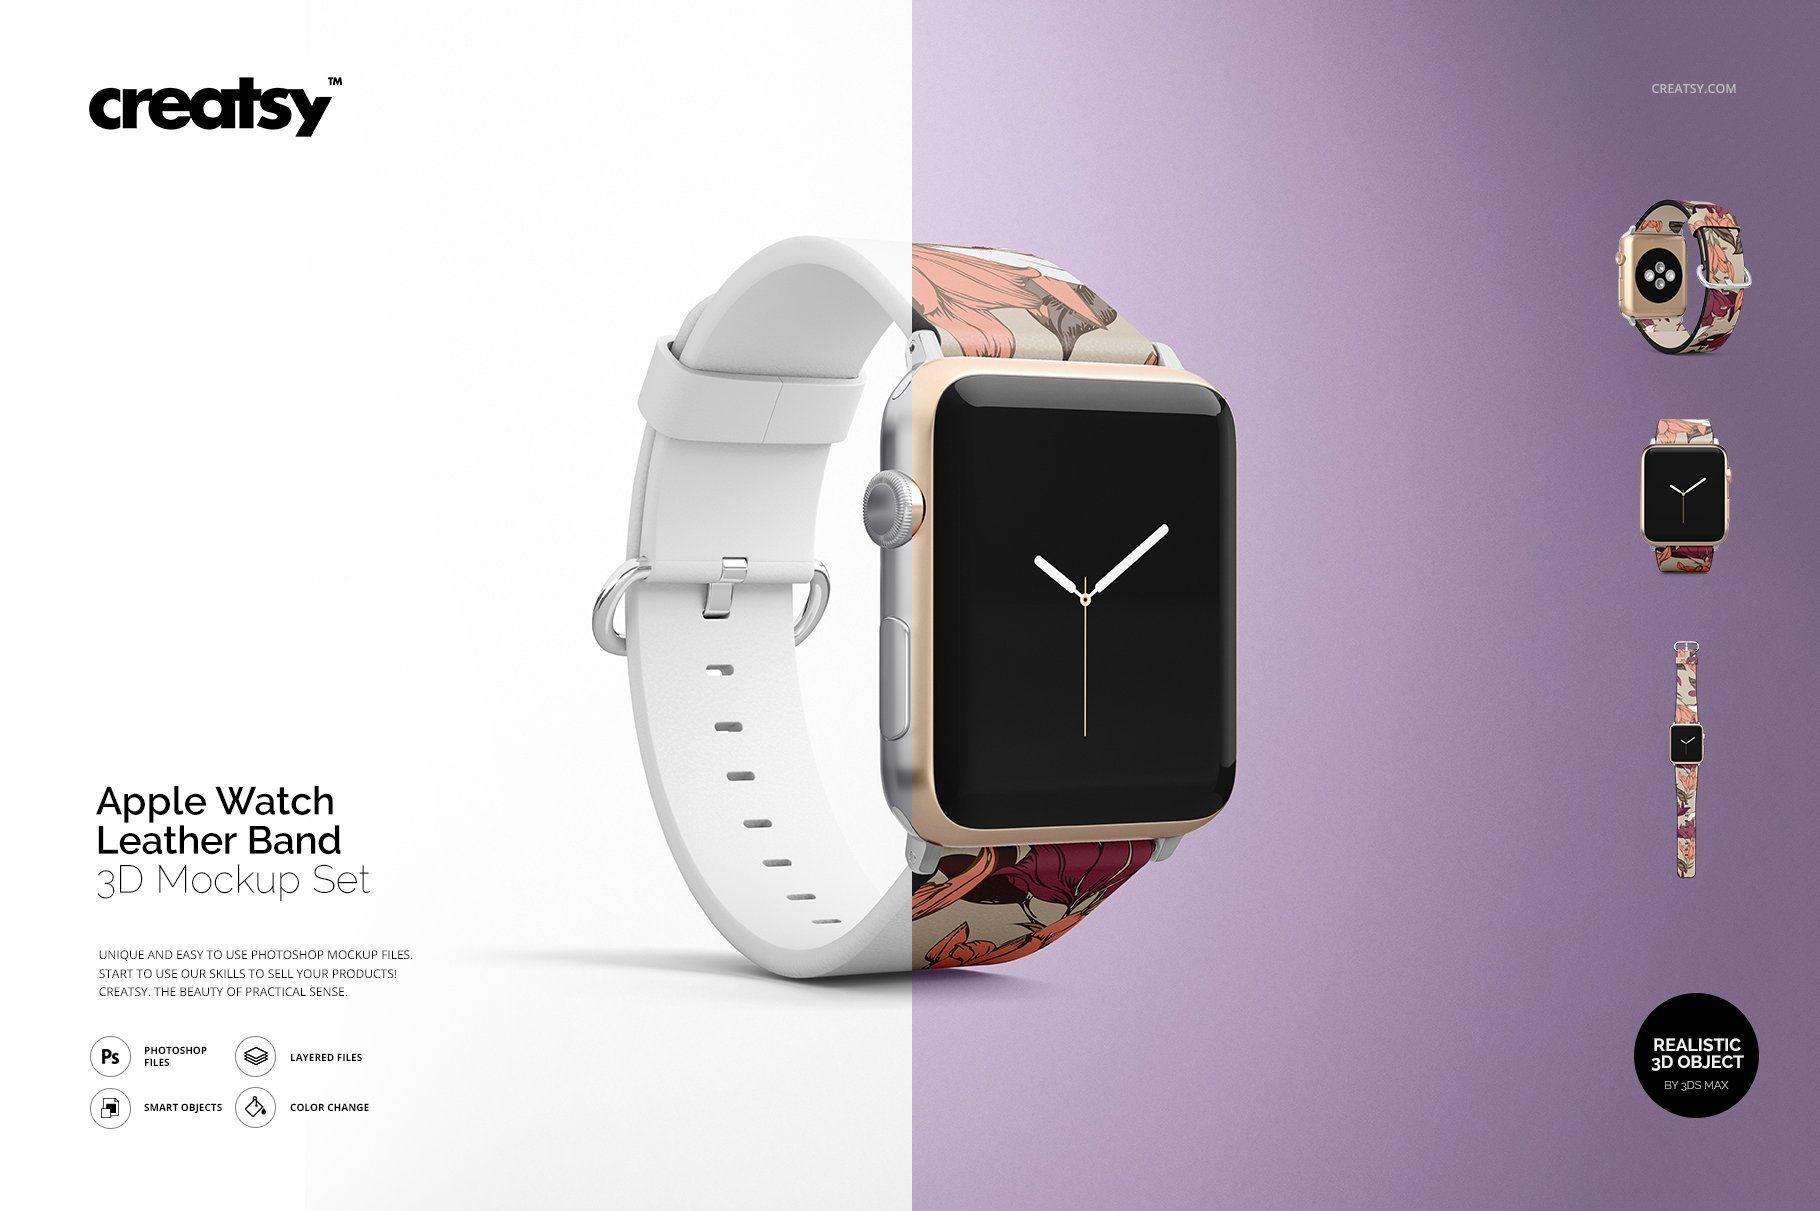 Apple Watch Leather Band Mockup Set 제품, 레이아웃